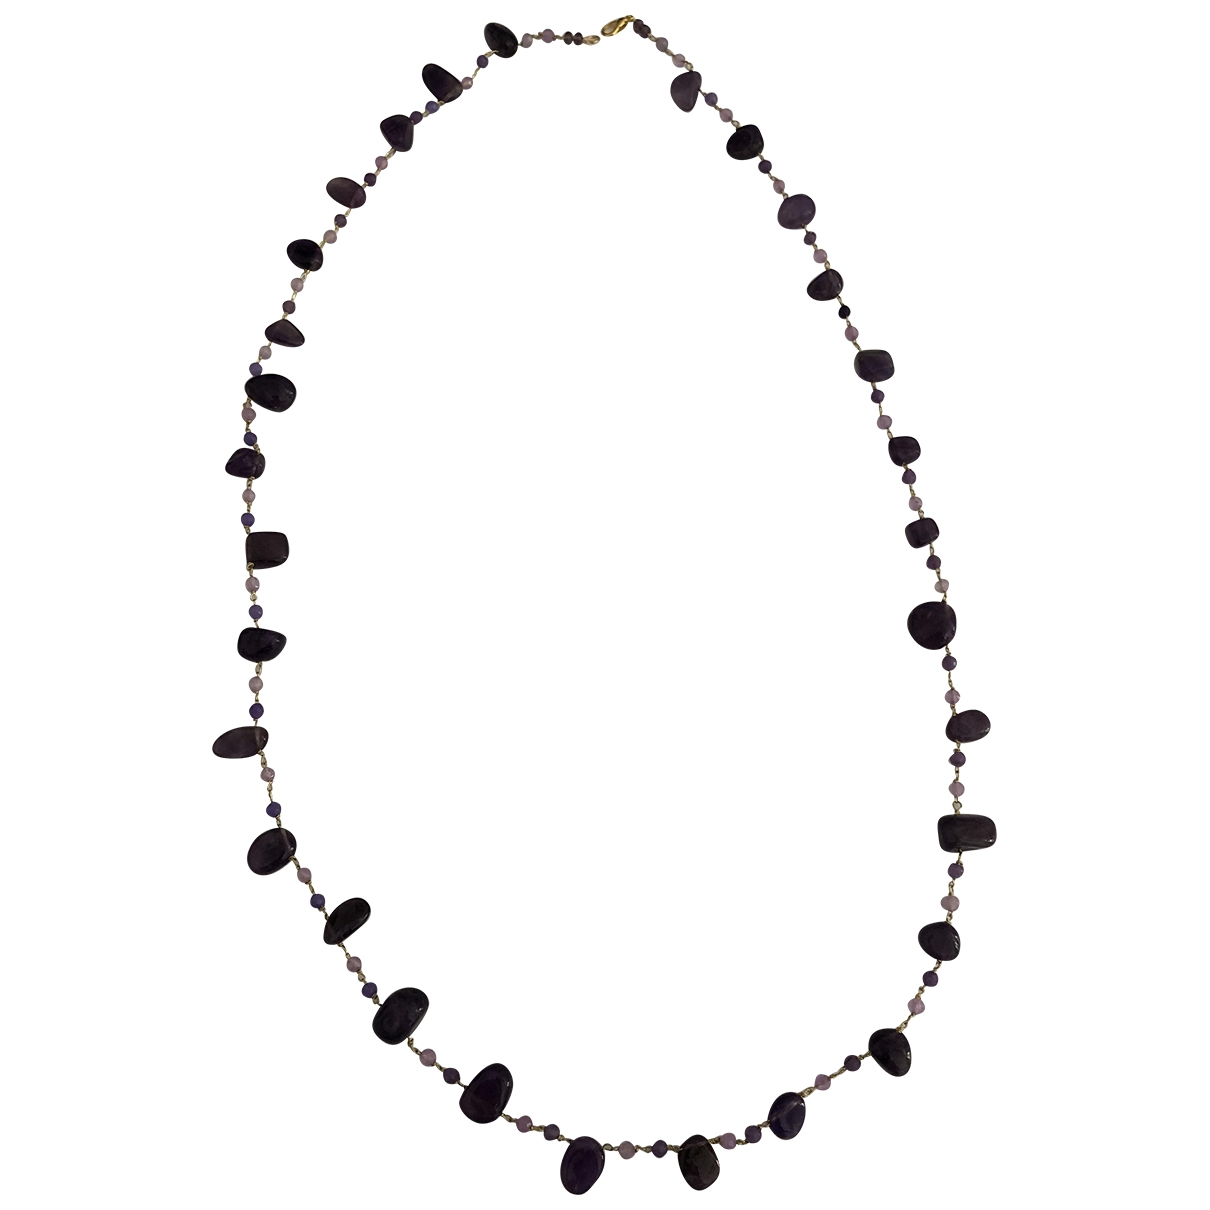 Collar Amethyste Non Signe / Unsigned